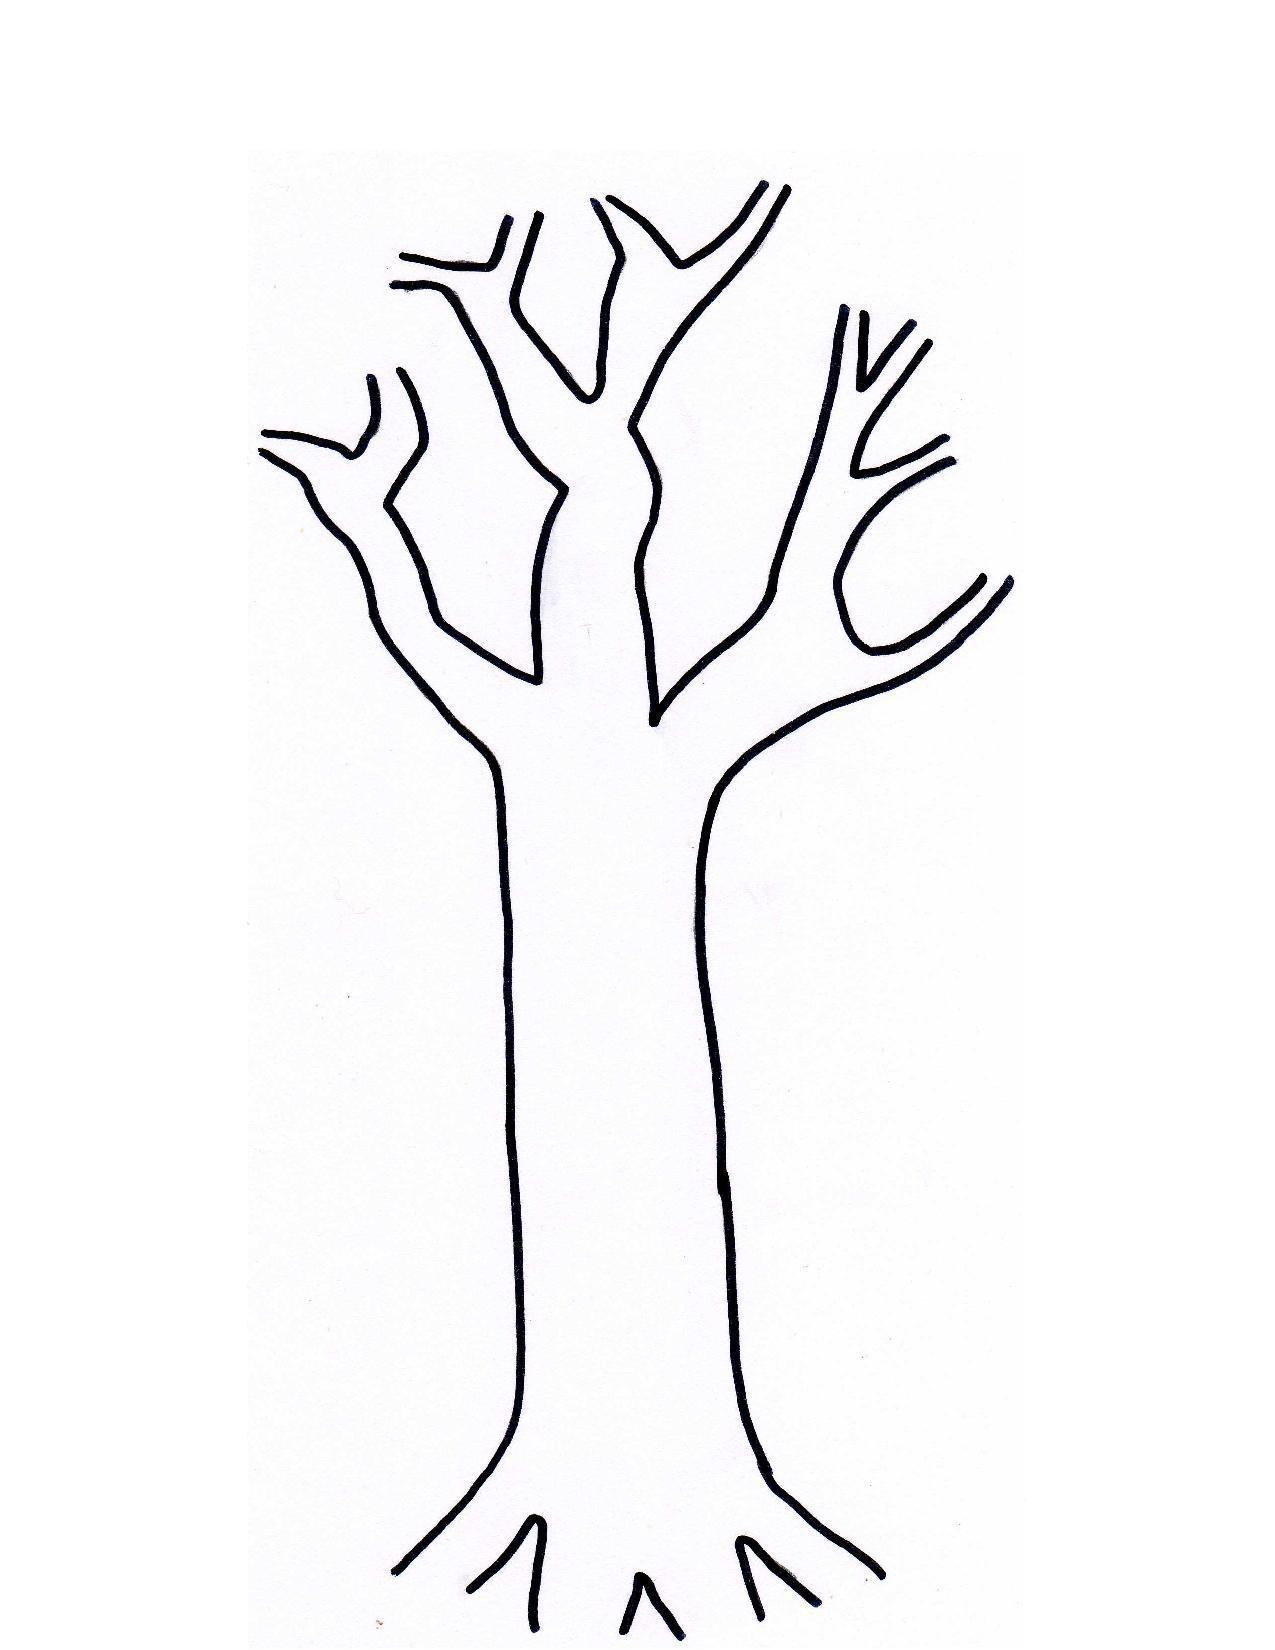 Free Tree Stump Cliparts, Download Free Clip Art, Free Clip.